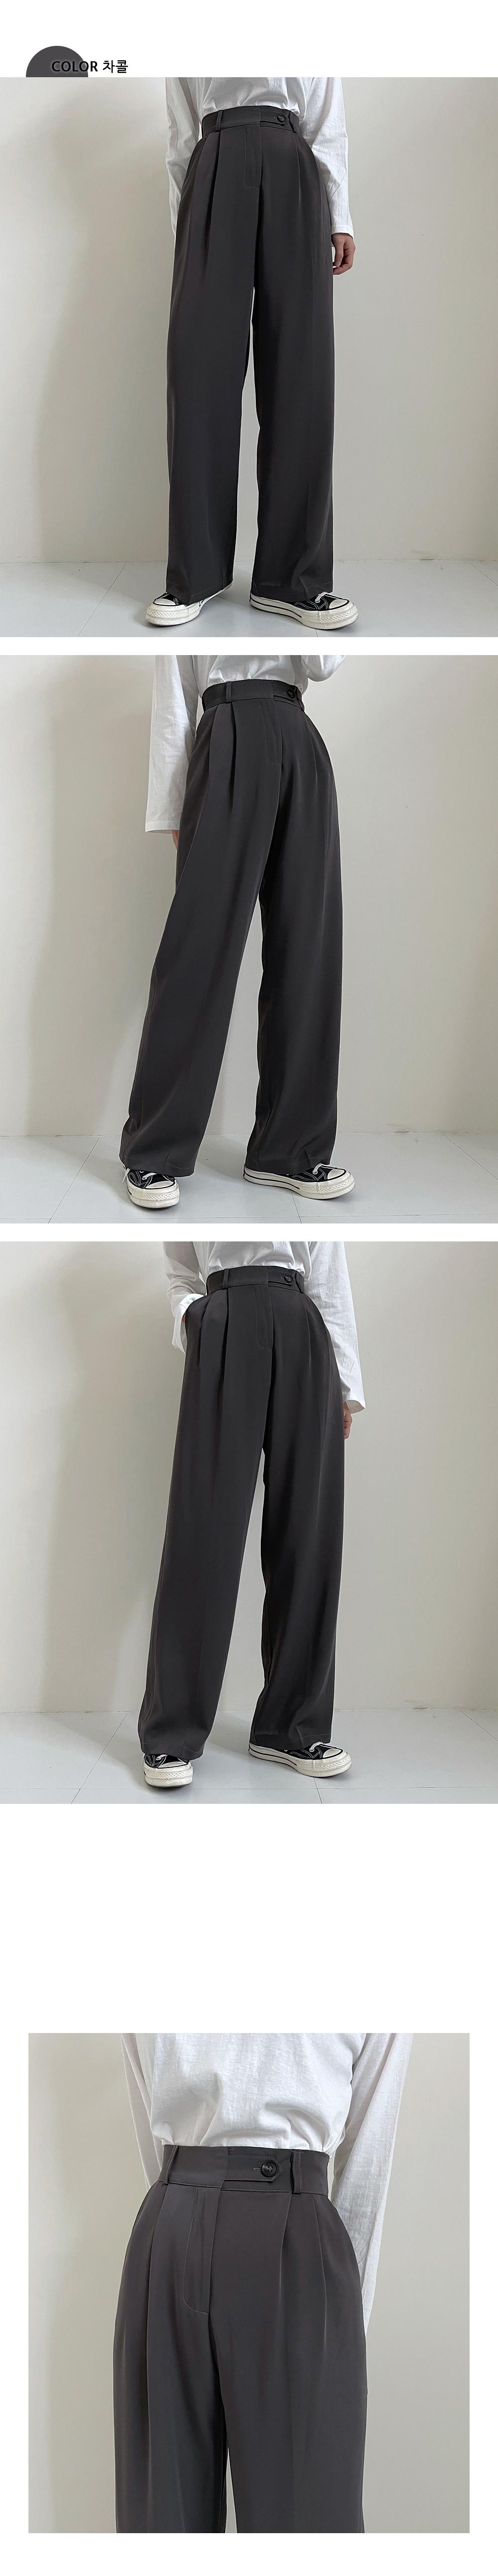 Tsarle button-to-pin tuck wide slacks